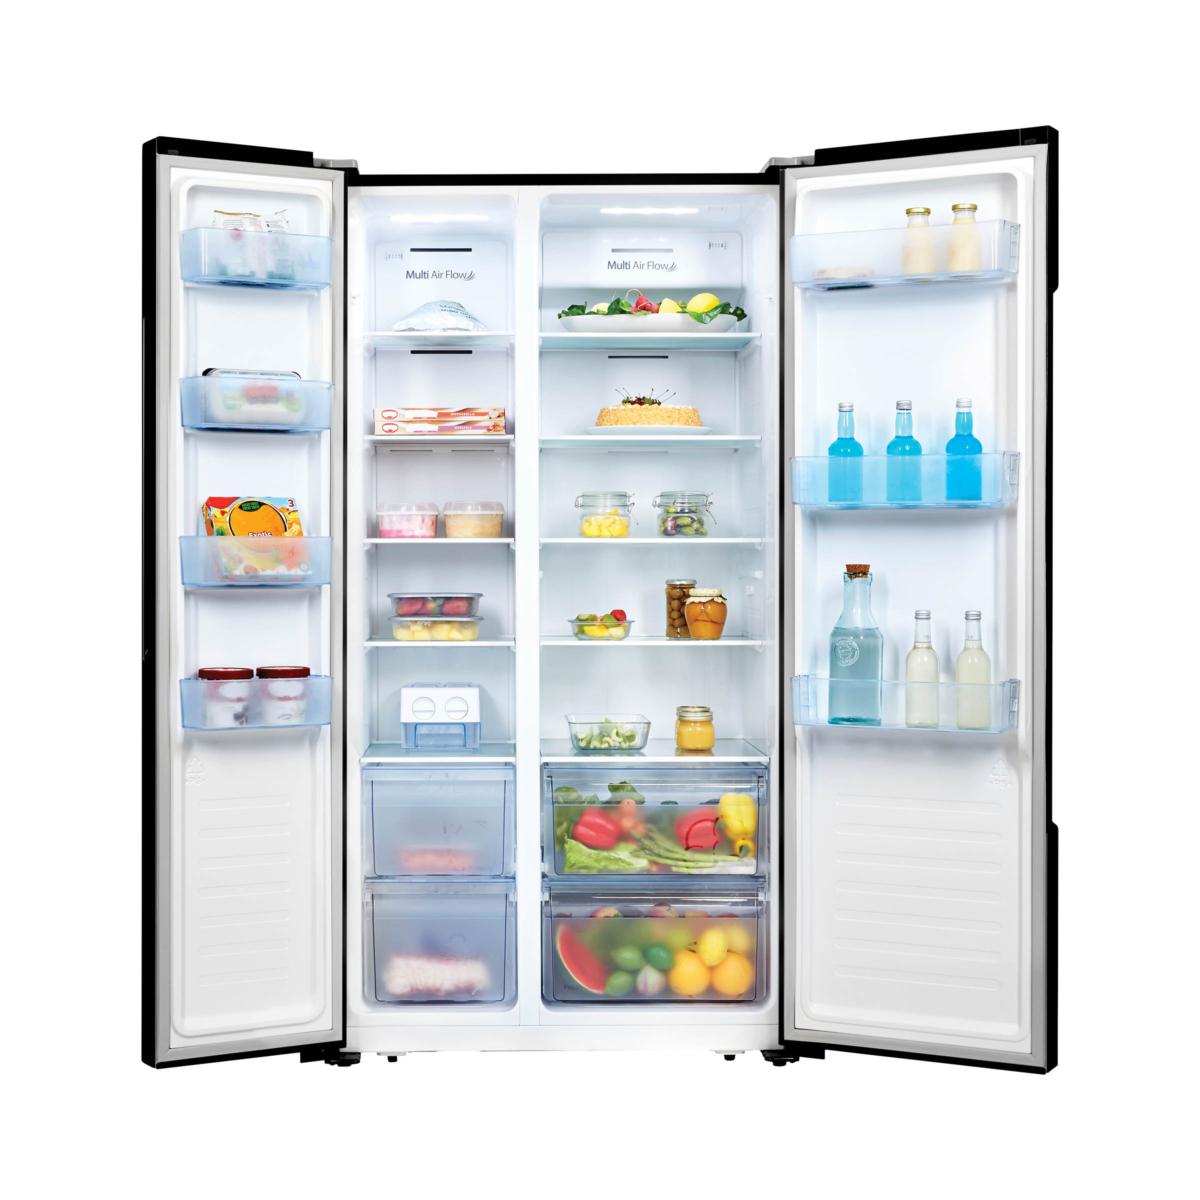 williams freezer controller manual programming